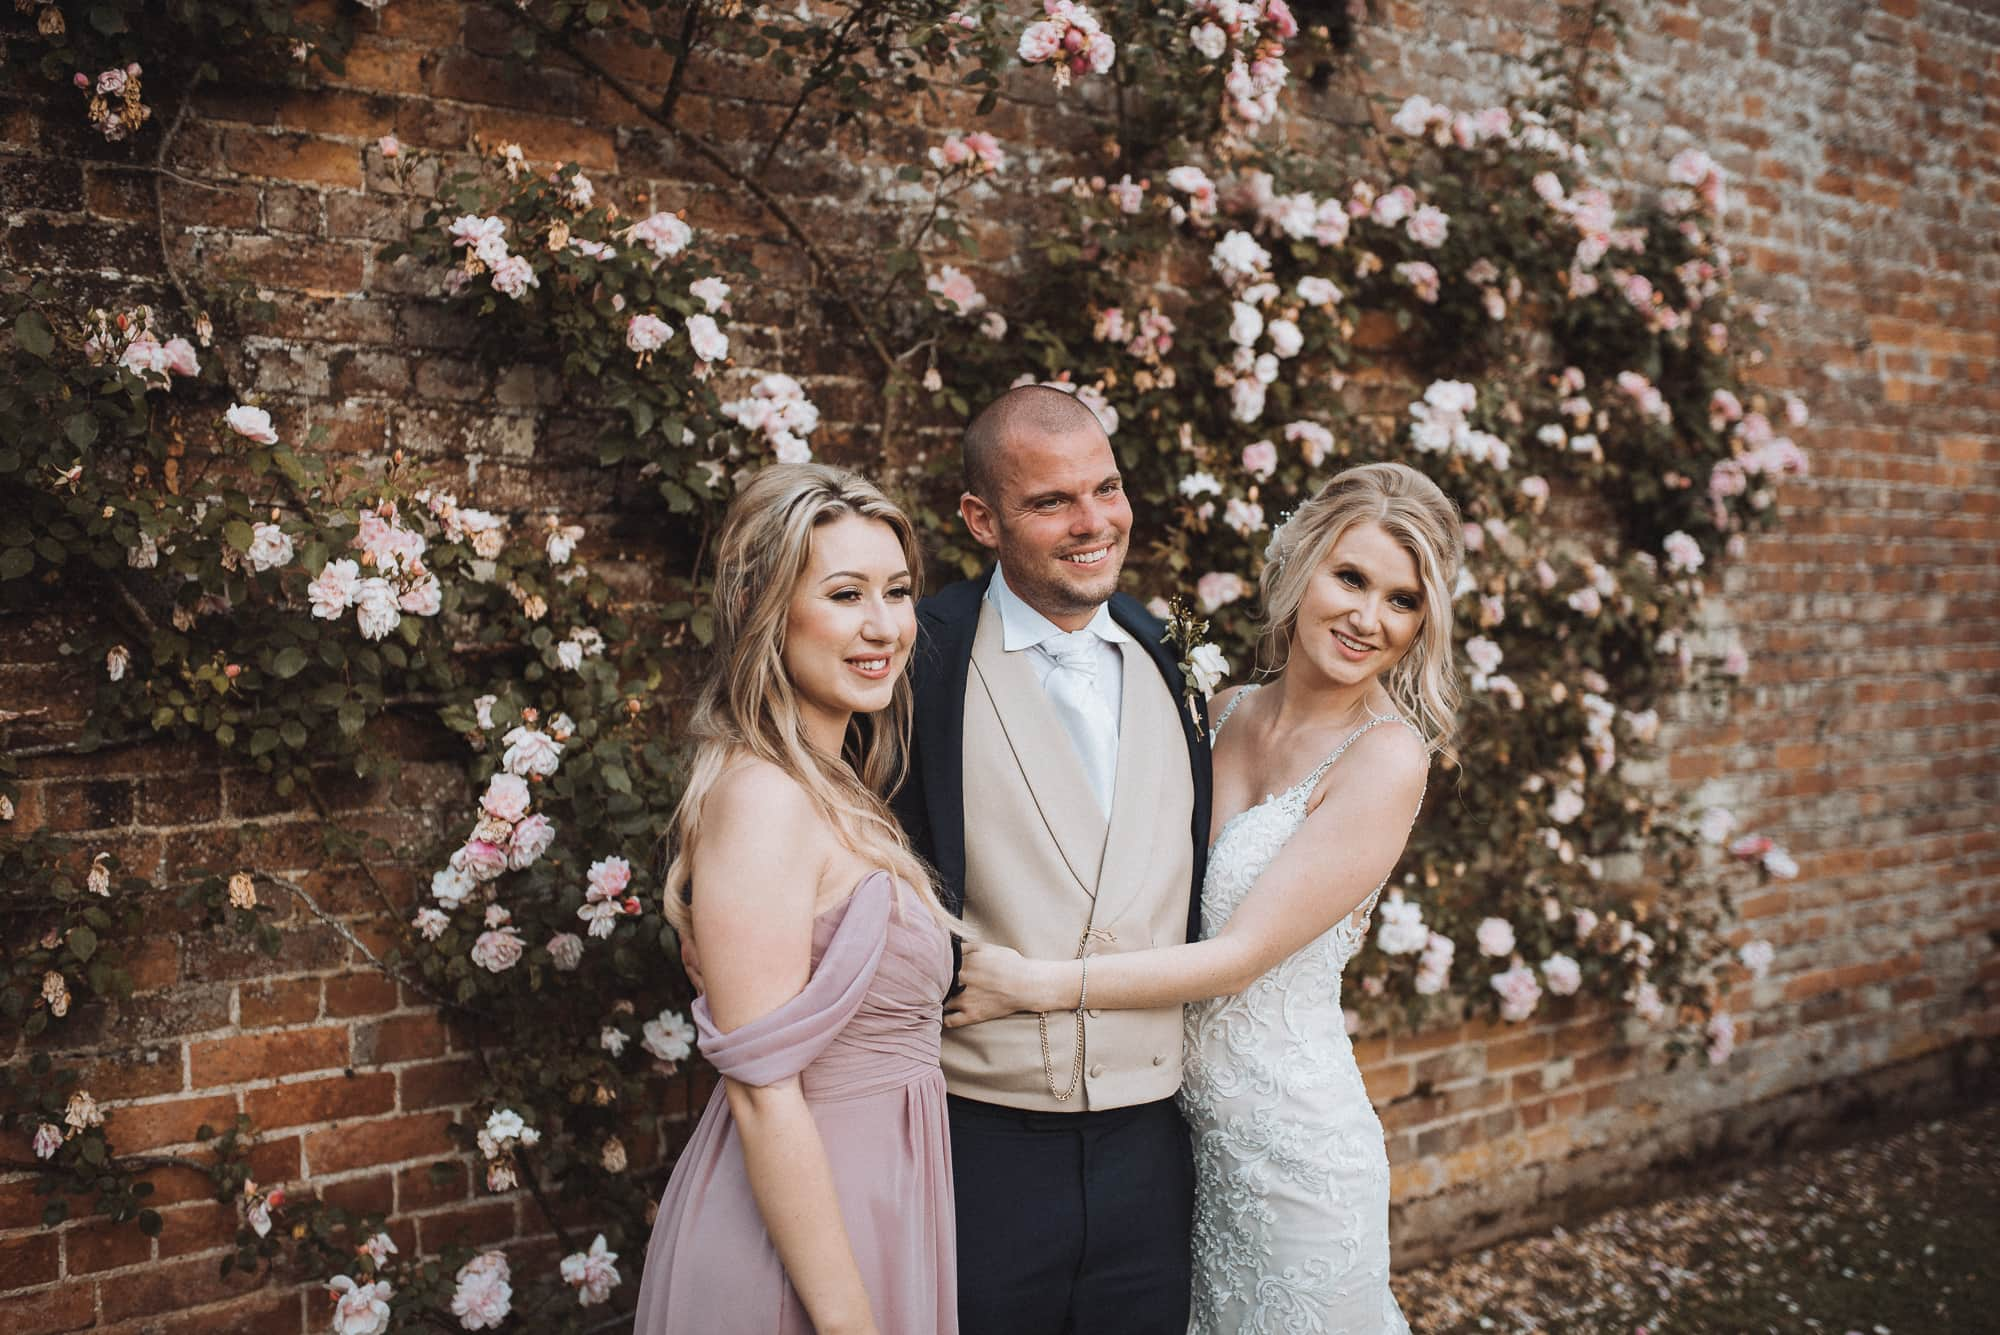 Bridal Party Couples Portraits Sunset Summer Wedding Photographer Tianna J-Williams Photography